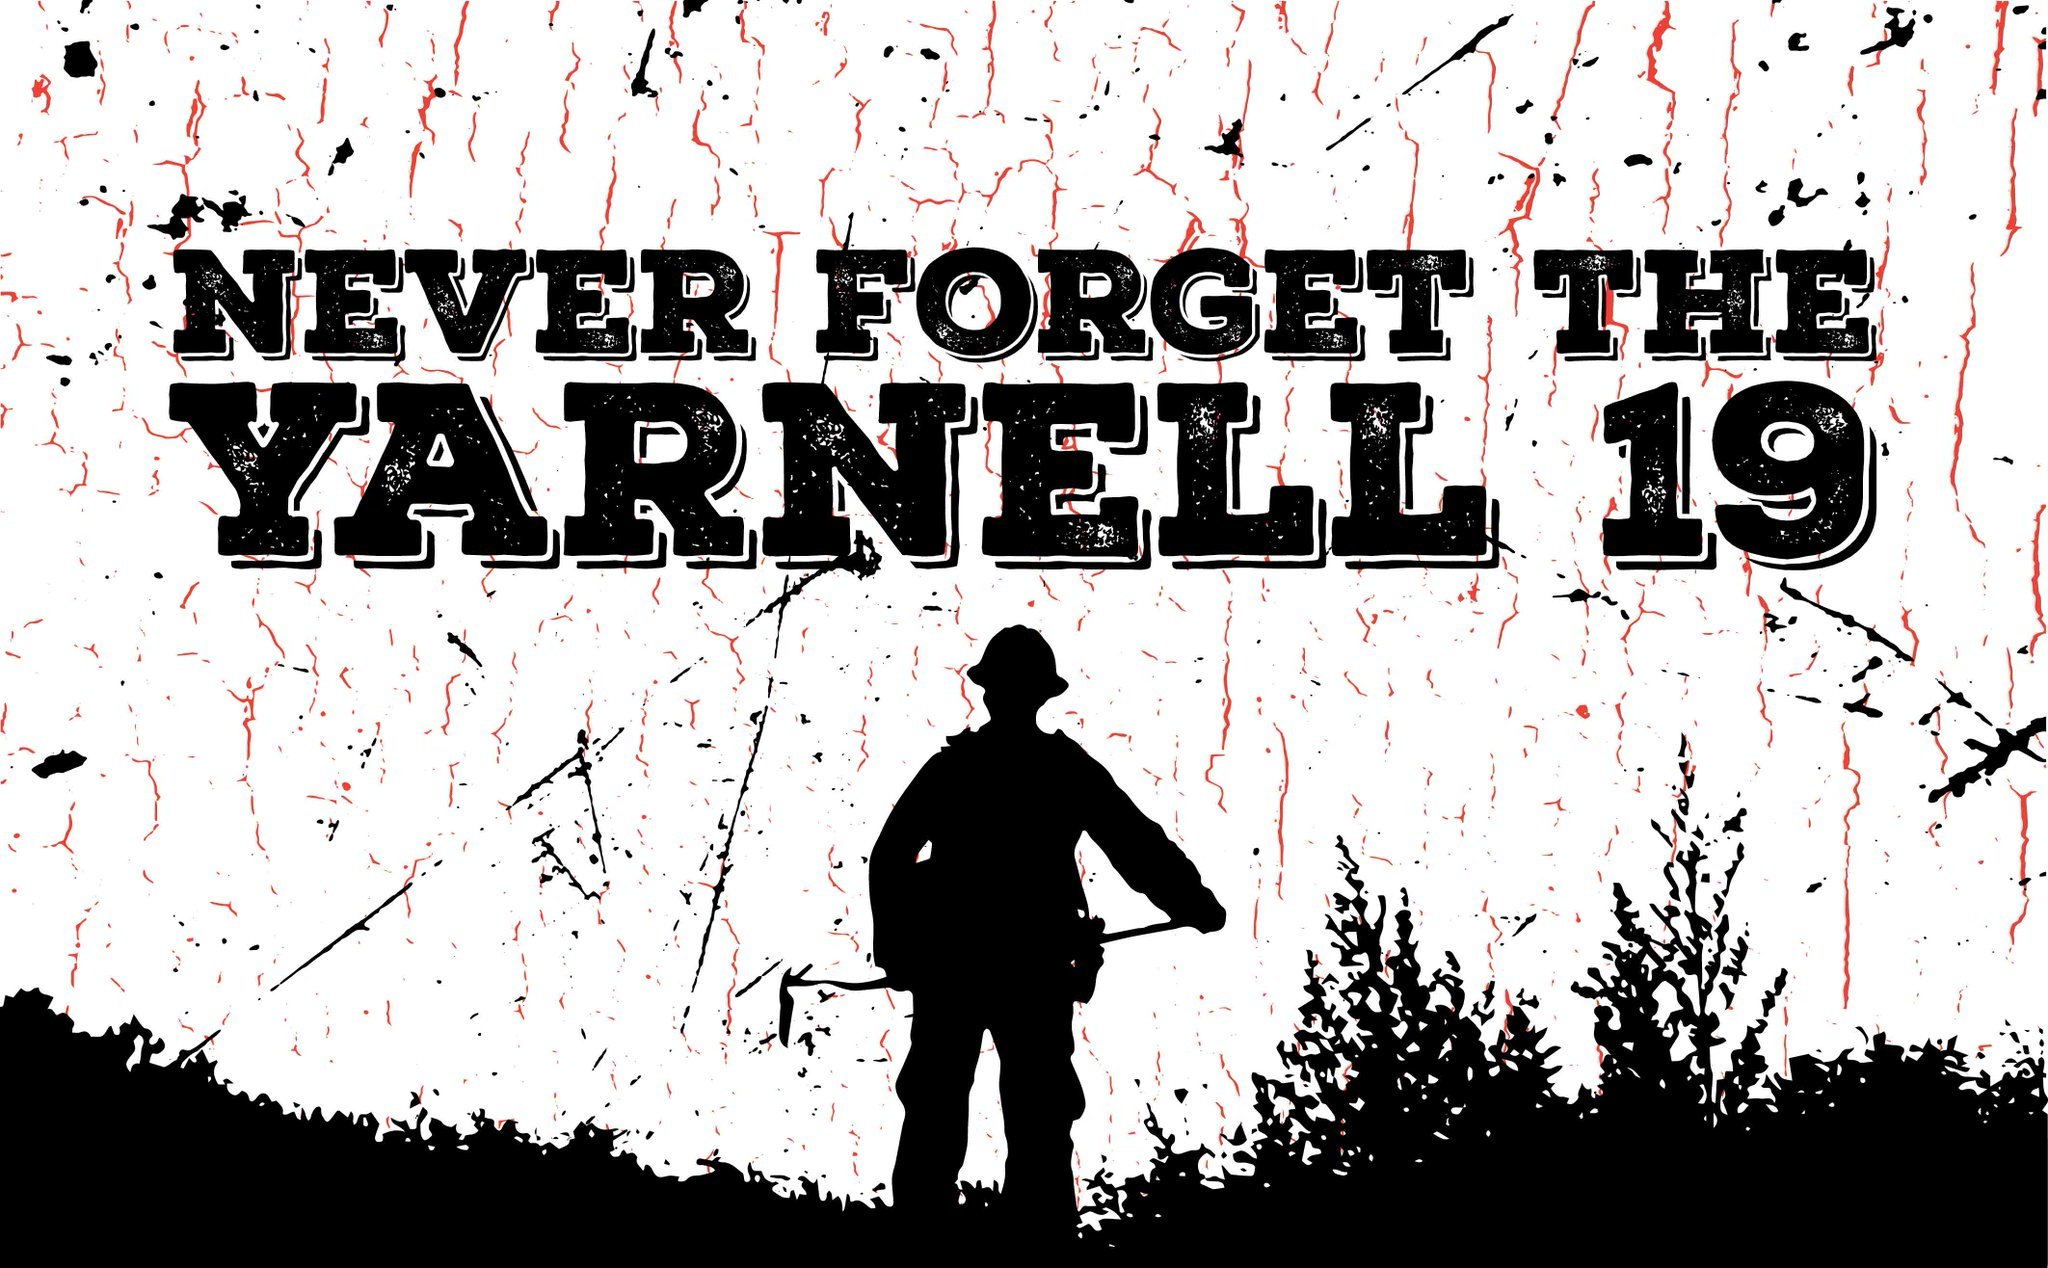 Arizona yavapai county yarnell - Doug Ducey Addresses Yarnell Hill Anniversary At Goodwin Fire Briefing